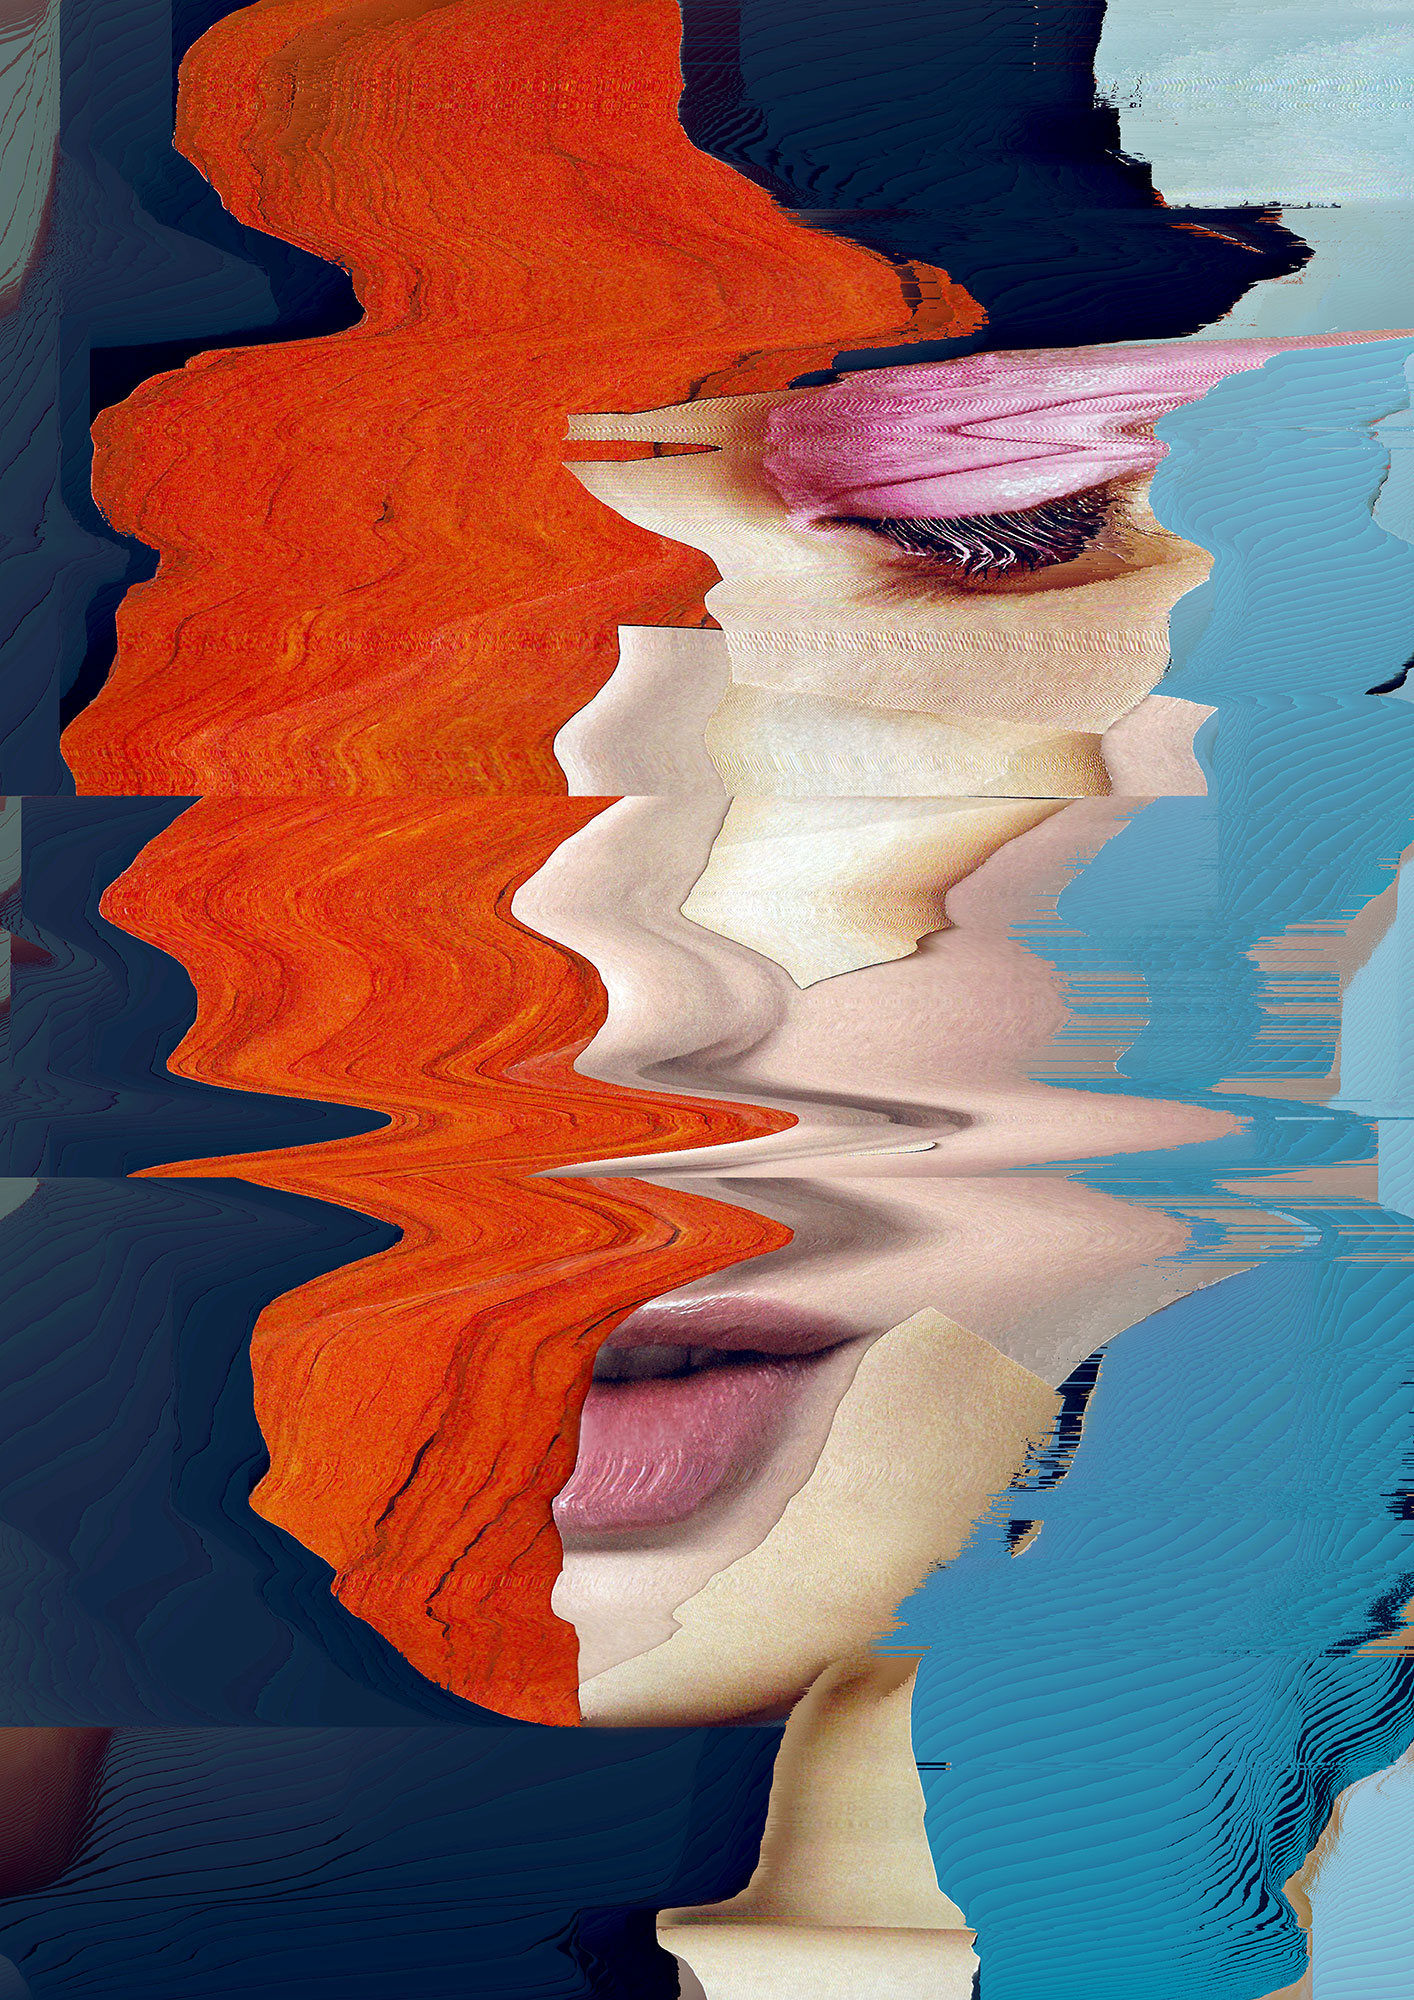 Ewa Doroszenko - Radical Beauty 07, photography